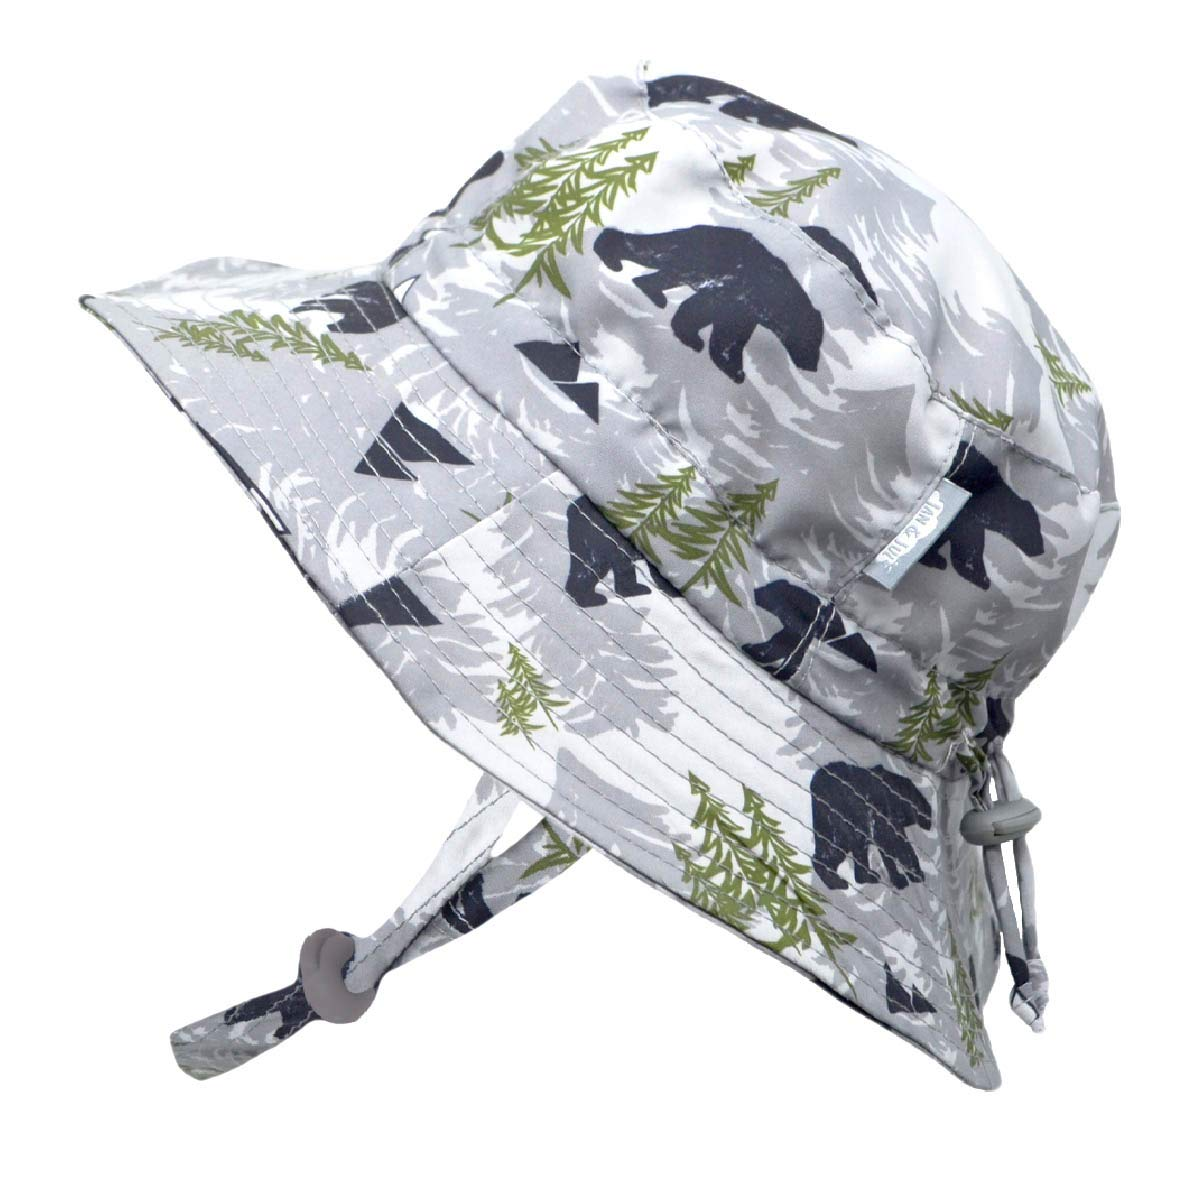 JAN & JUL Boys Summer Aqua-Dry Swim Sun Hats 50 UPF, Adjustable Foldable Packable (XL: 5-12Y, Bear)